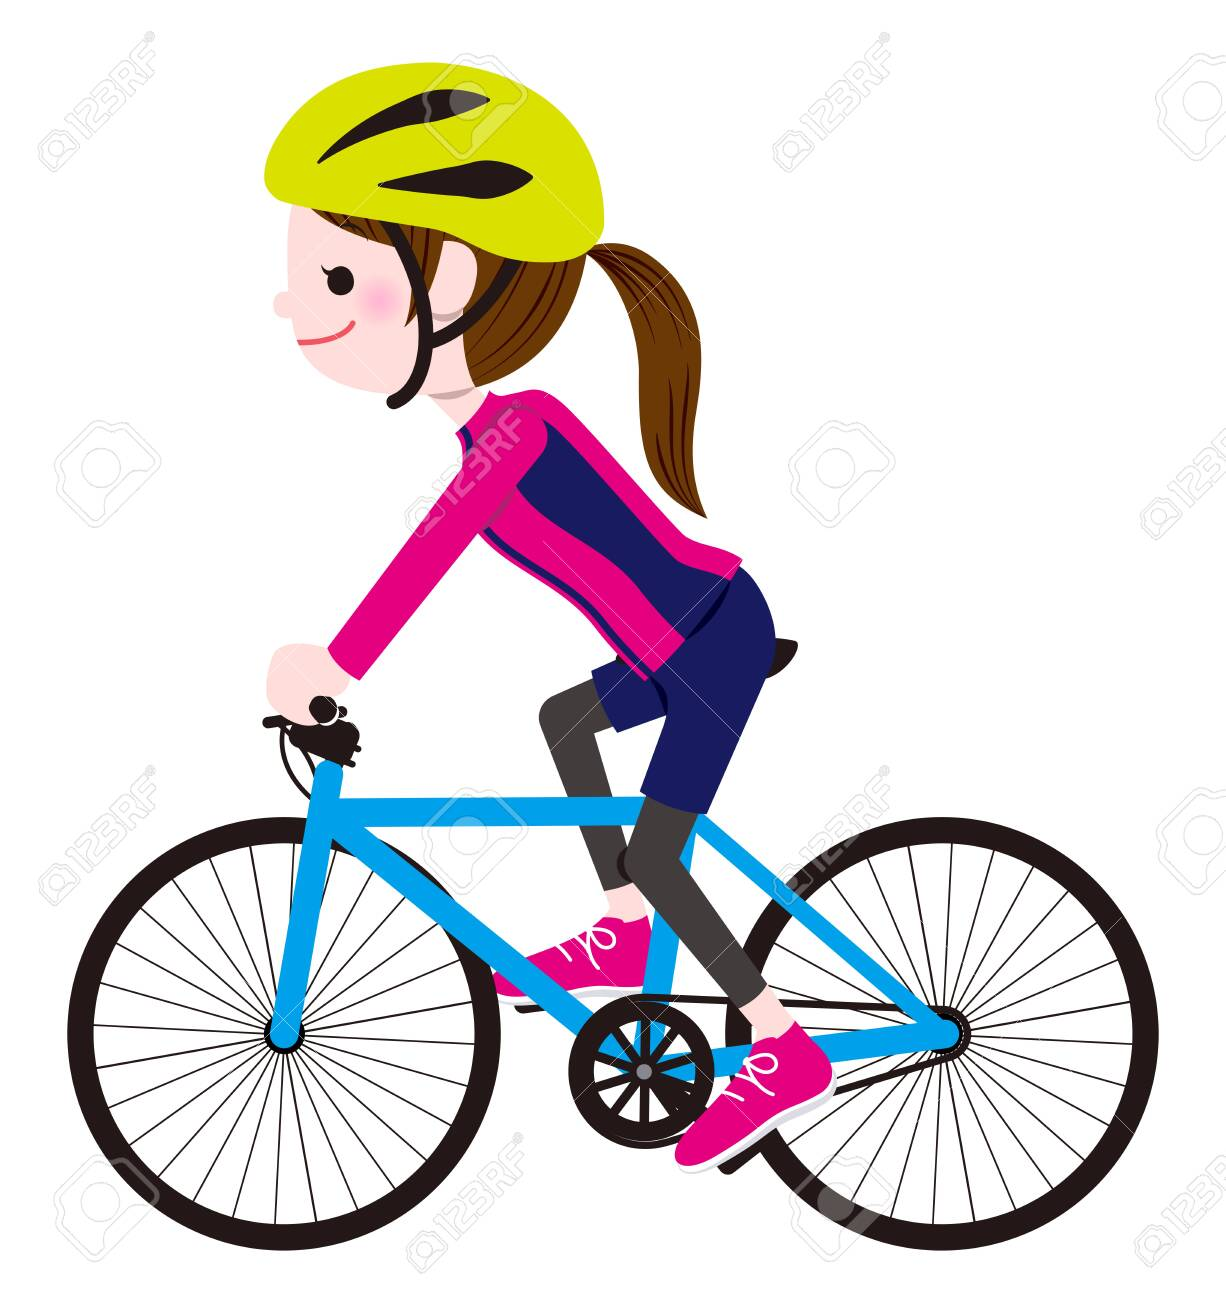 Cycling Woman - 151831238